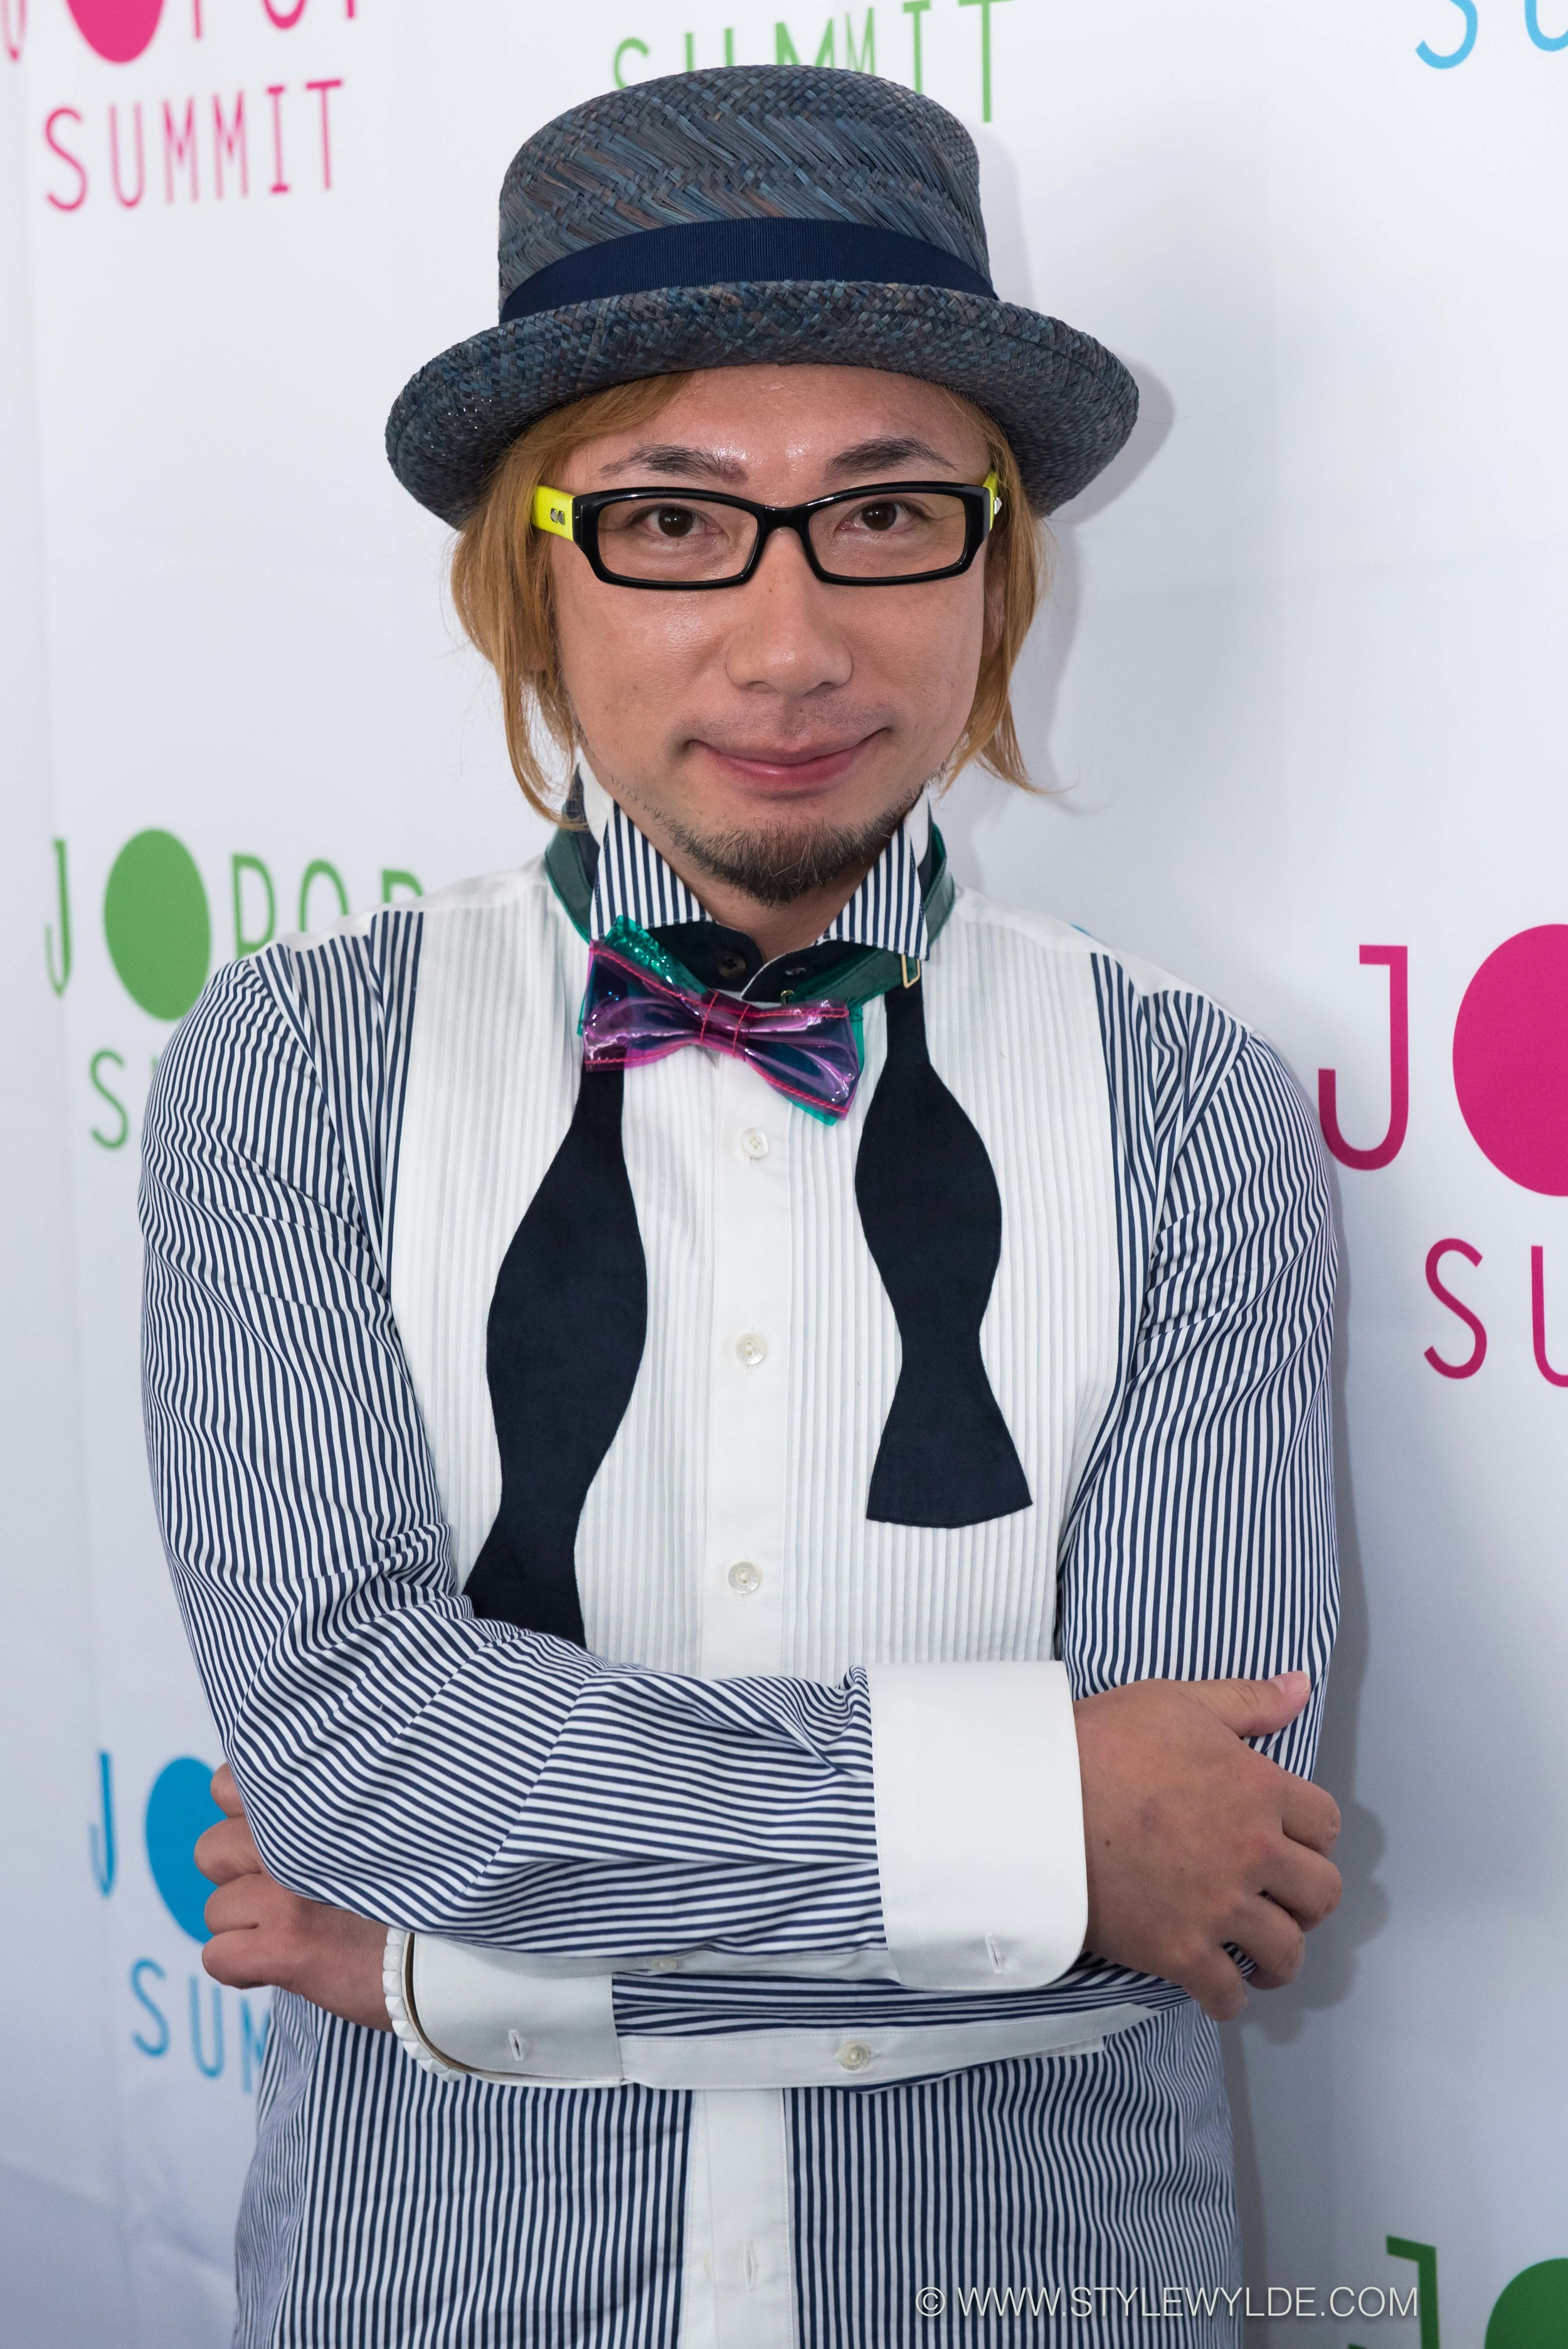 Sebastian Masuda/Image: Cynthia Hope Anderson for Style Wylde